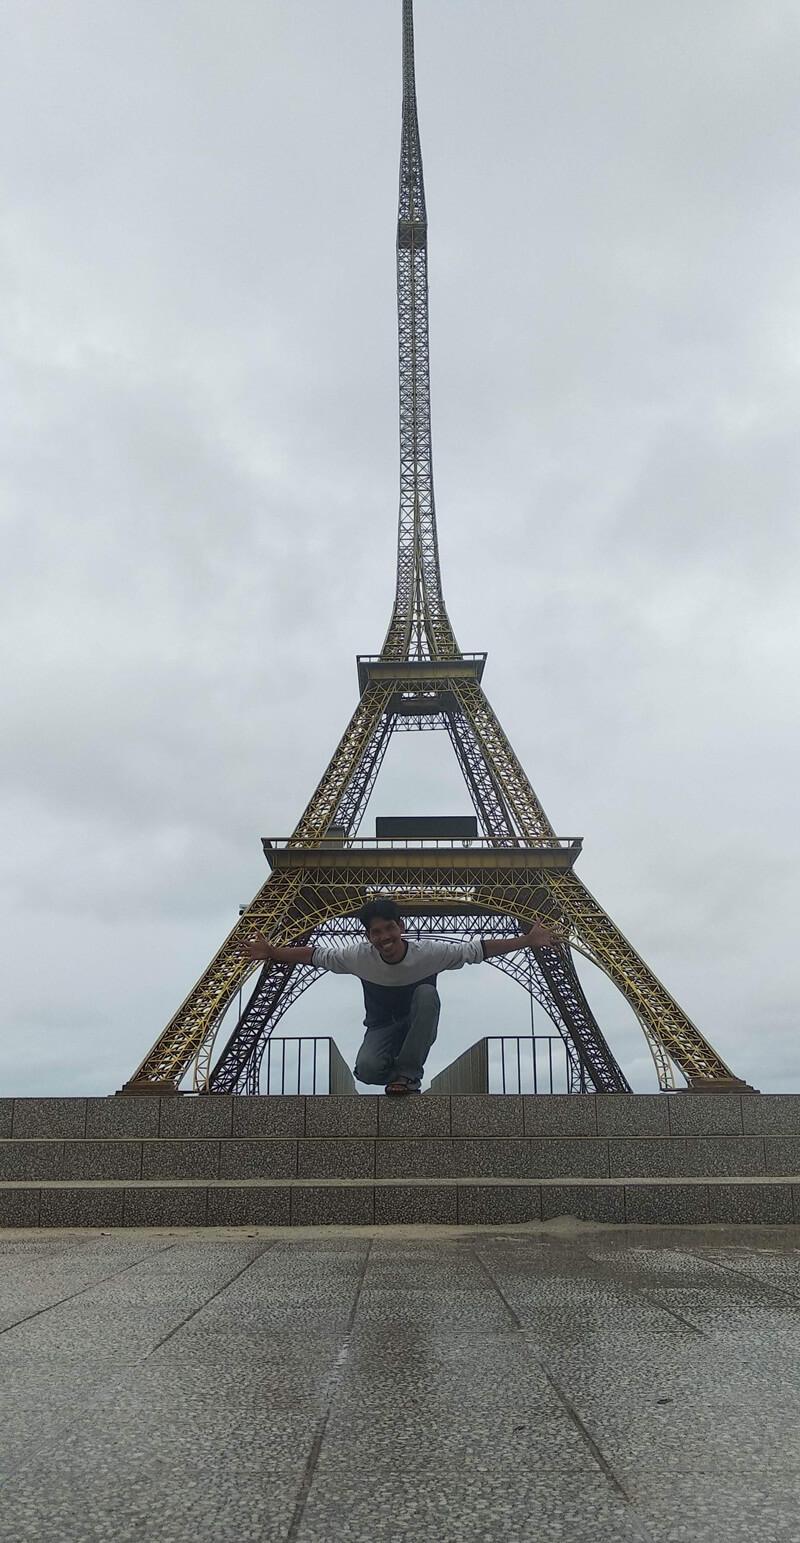 berfoto bersama miniatur menara eiffel